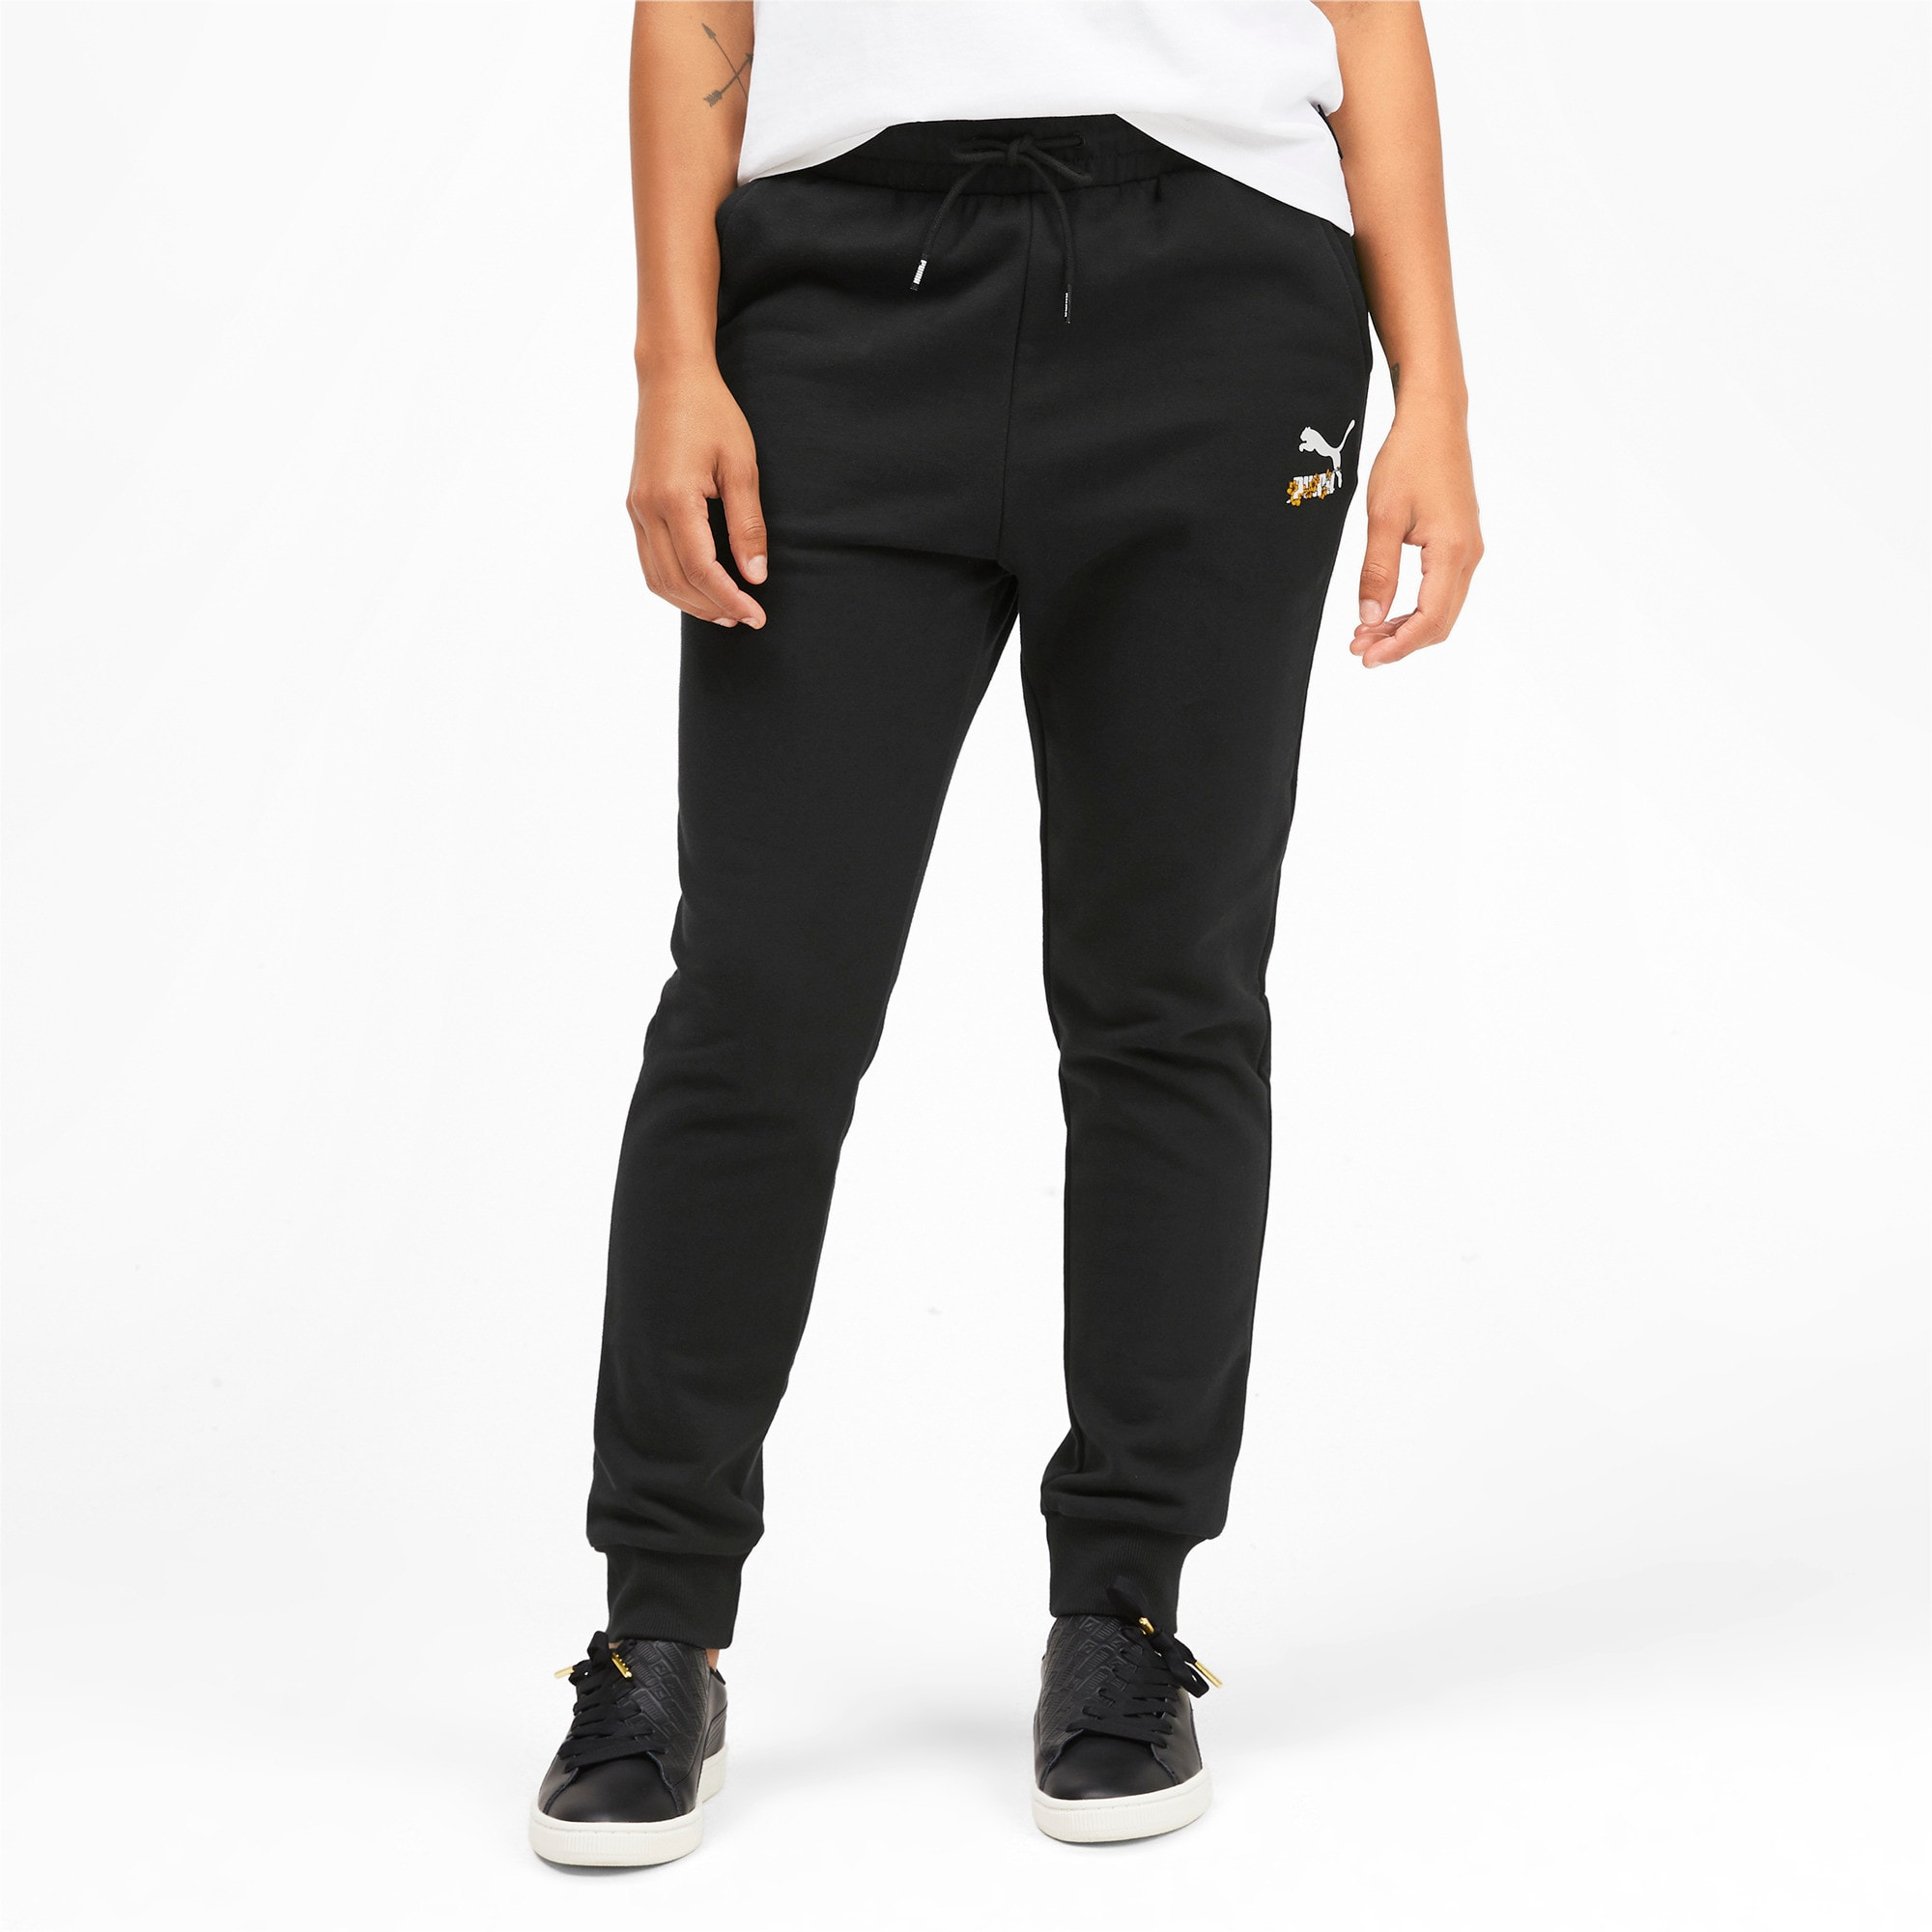 Miniatura 2 de Pantalones deportivosSakurapara mujer, Puma Black, mediano